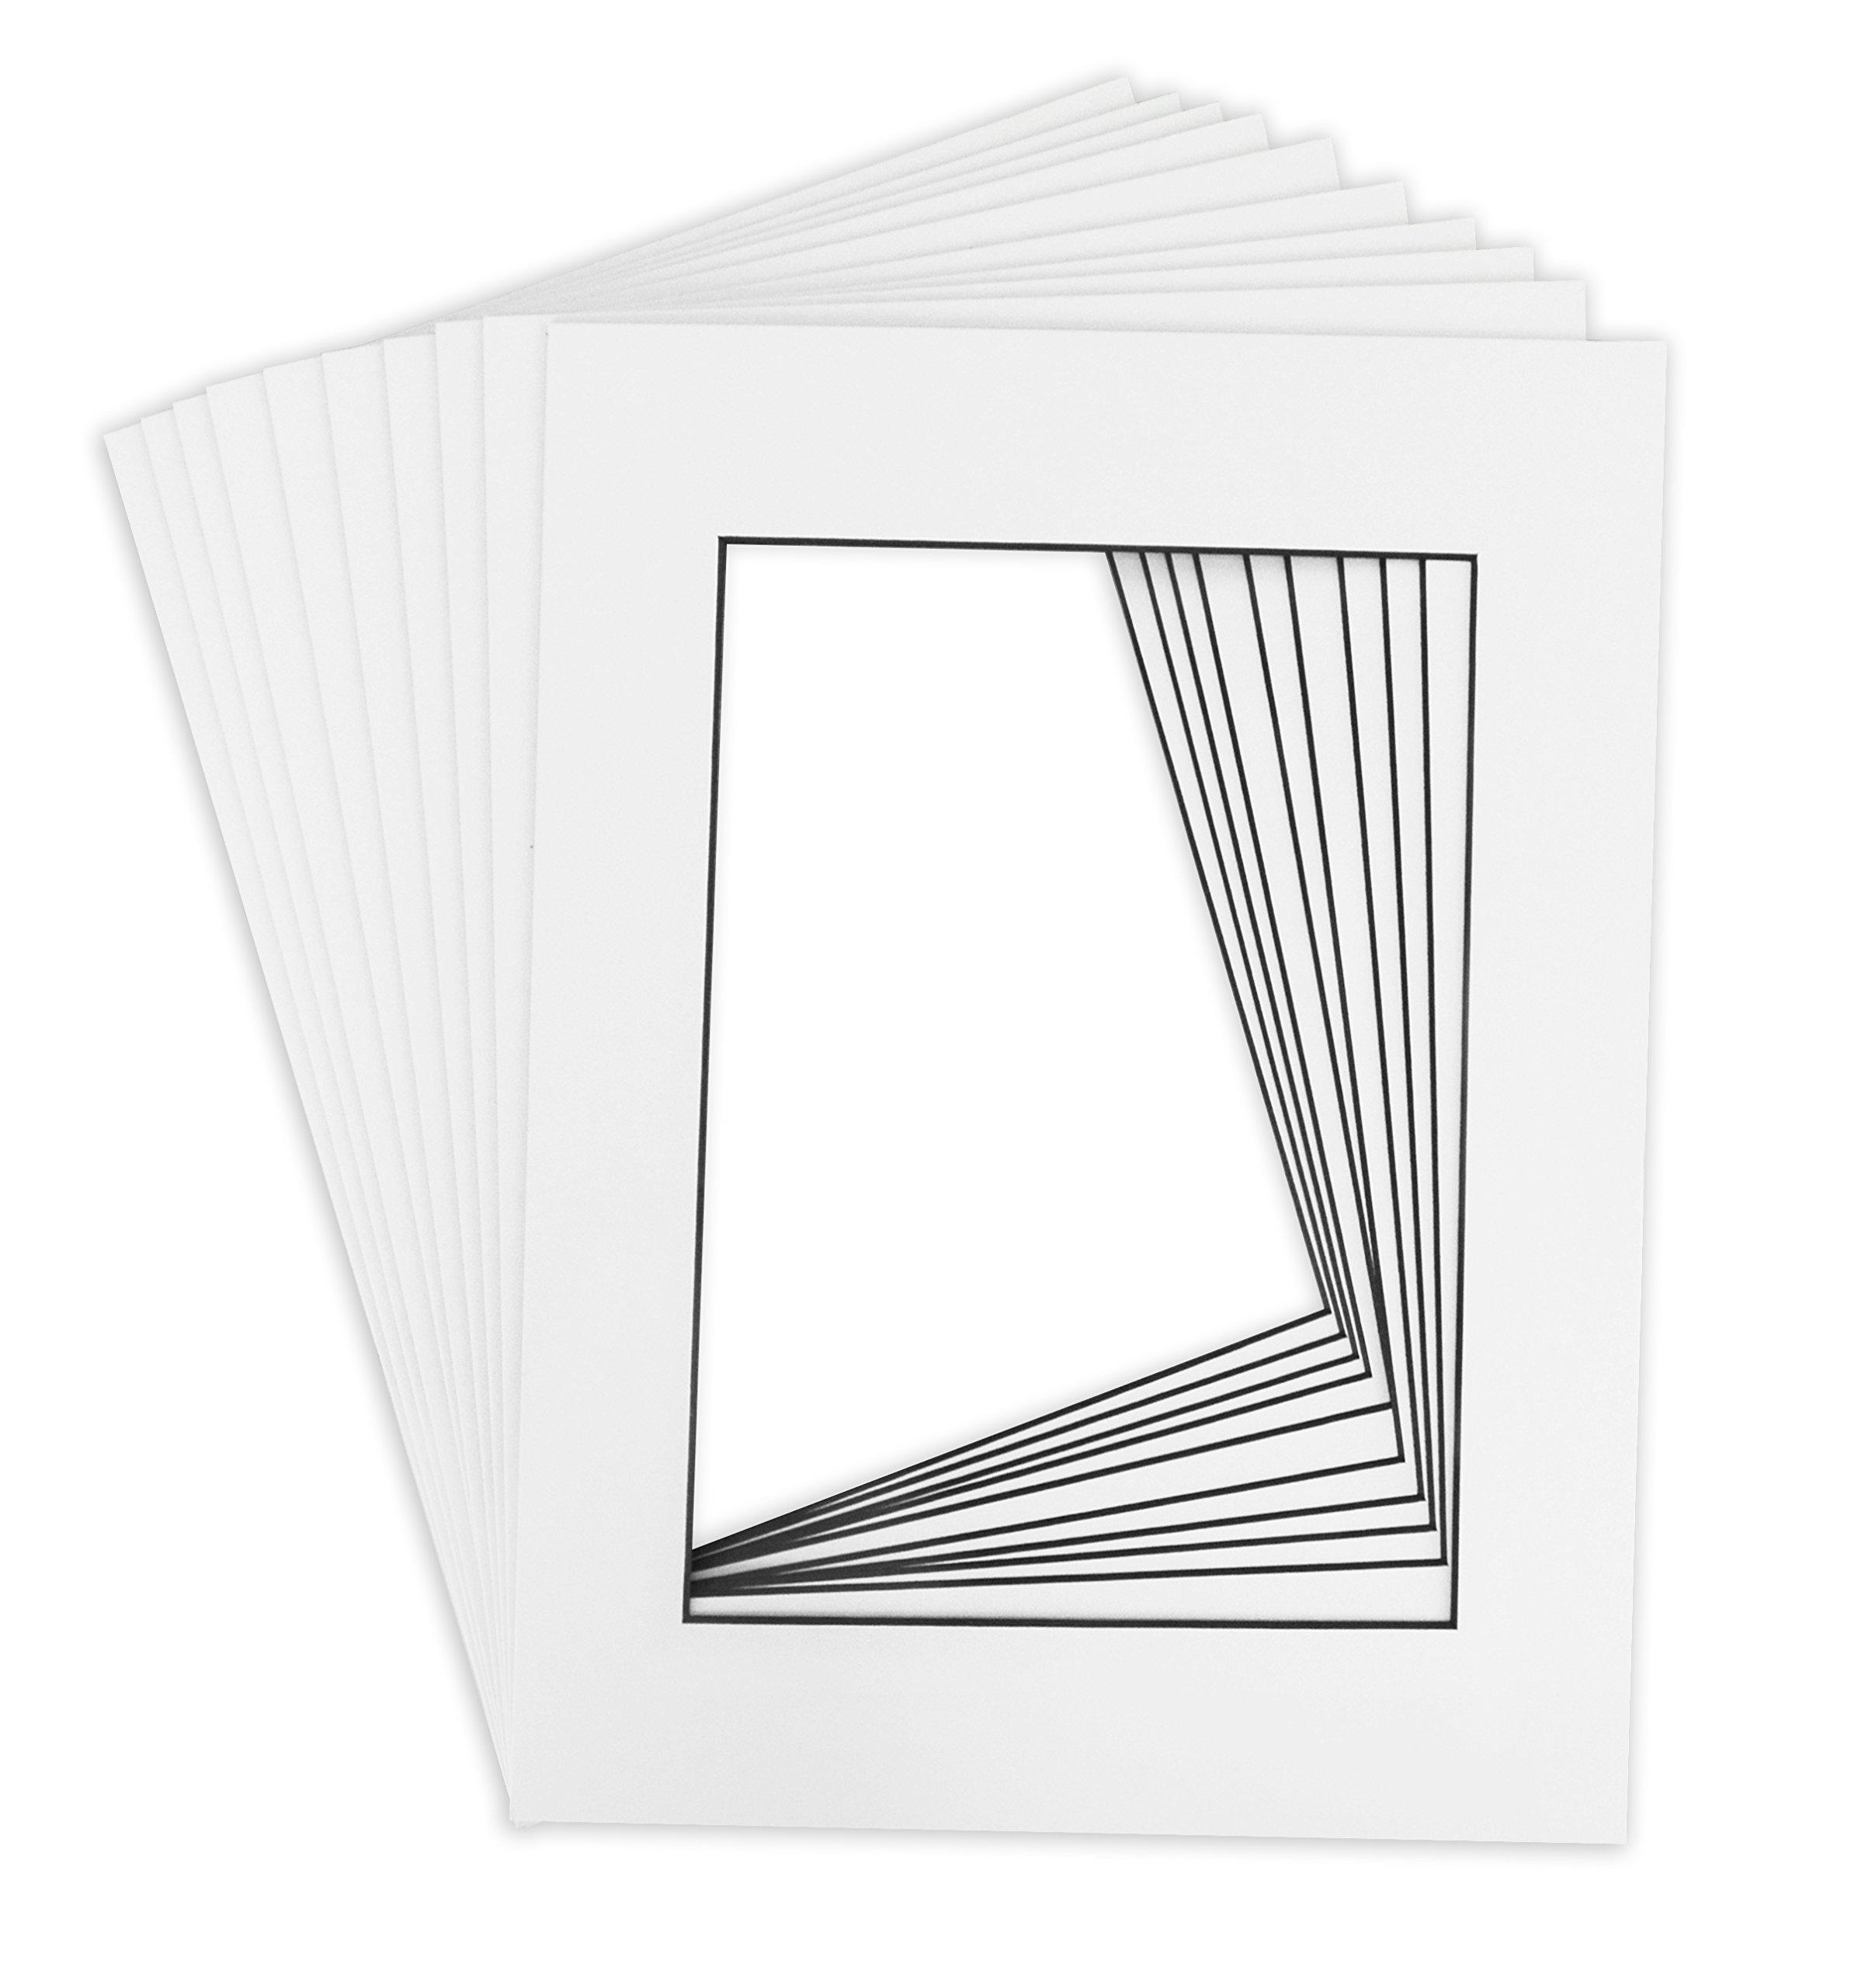 BLACKCORE MAT, 10 of 18x24 White Pre-cut Acid-free for 12x18 +back+bag